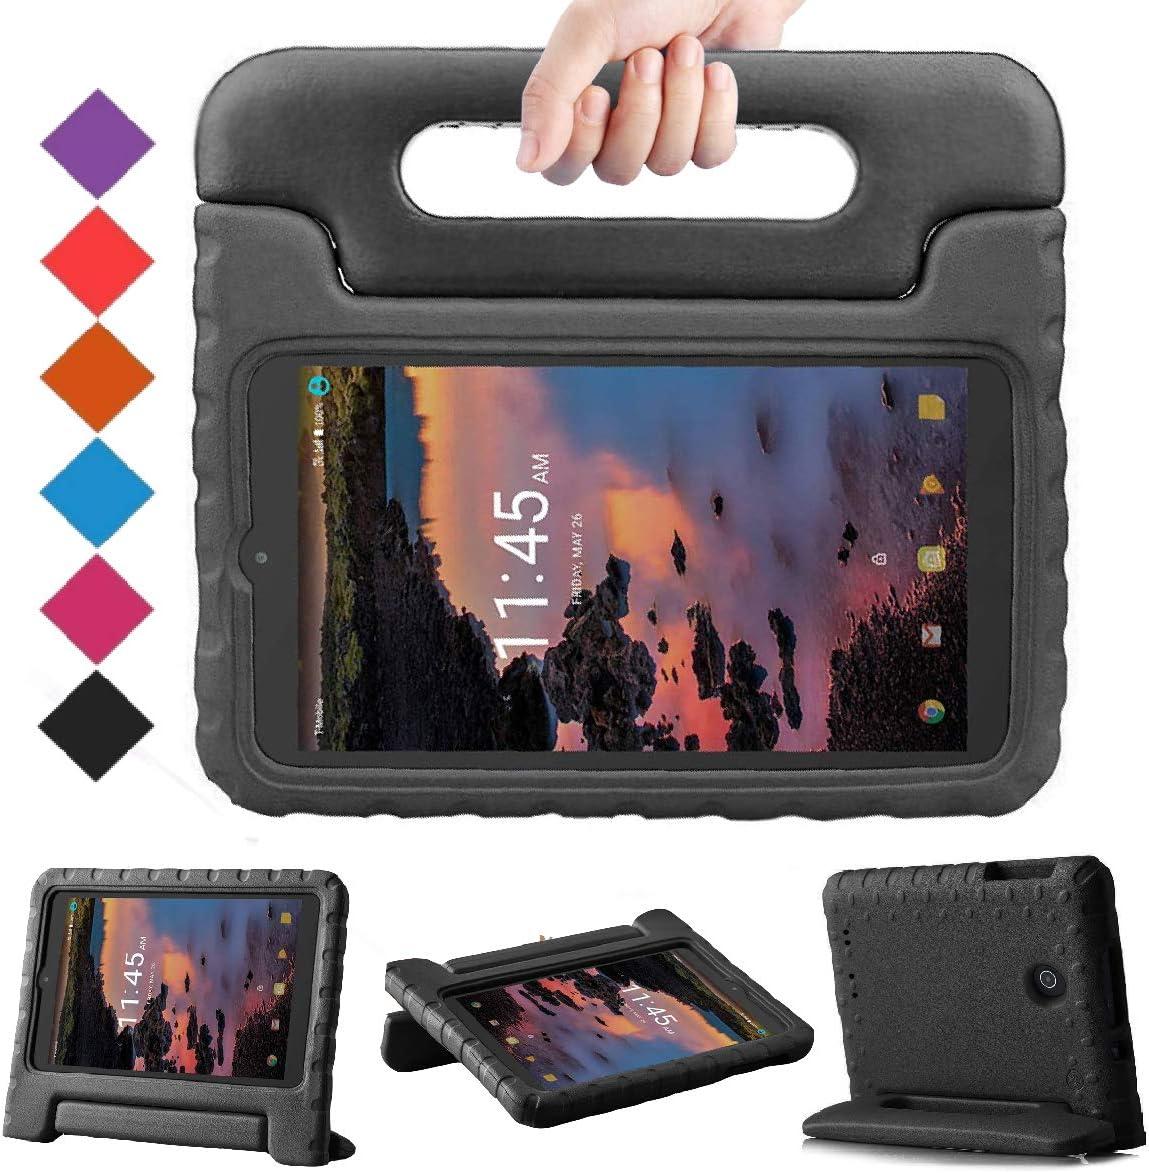 BMOUO Kids Case for Alcatel Joy Tab 8 2019/T-Mobile 3T 8 Tablet 2018/A30 Tablet 8 2017, Lightweight Kid-Proof Handle Stand Case for Alcatel Joy Tab 2019/Alcatel 3T 8 2018 / A30 8 inch 2017 - Black